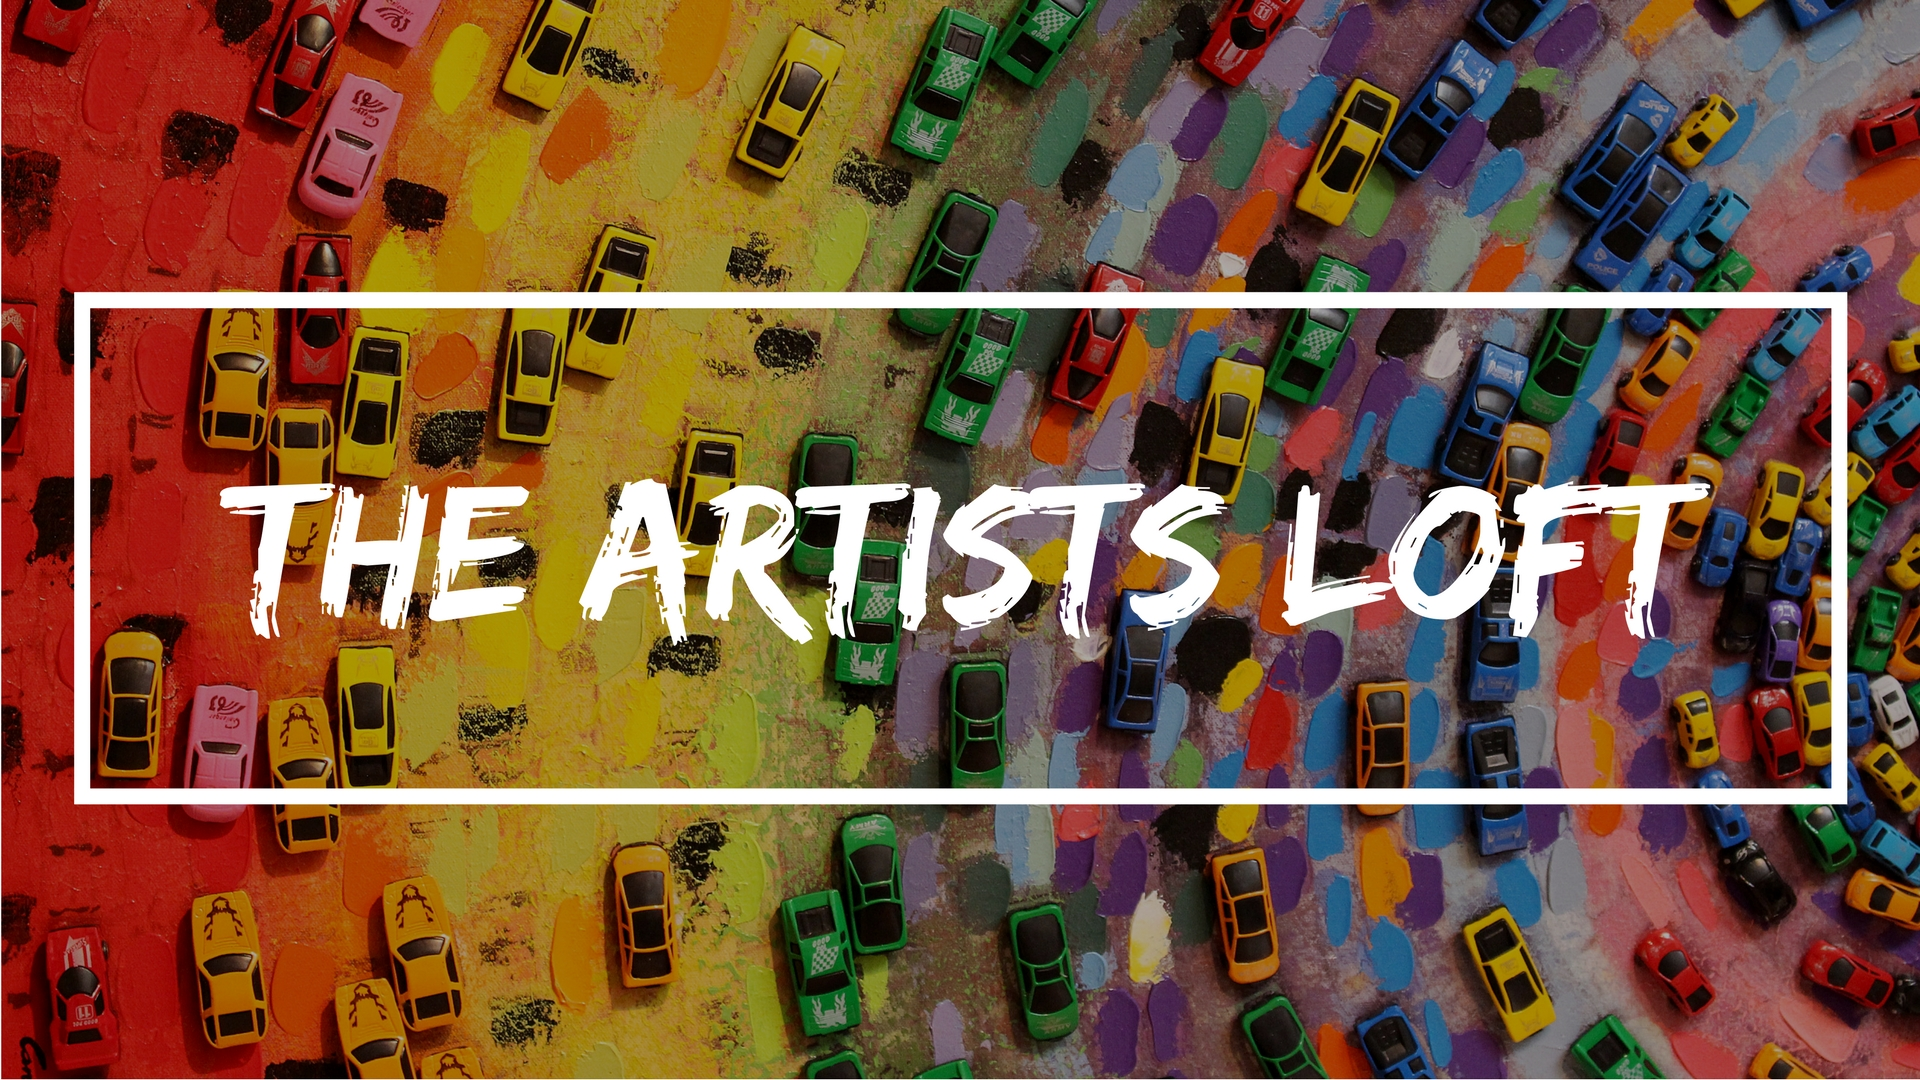 THE_ARTISTS_LOFT_(1).jpg